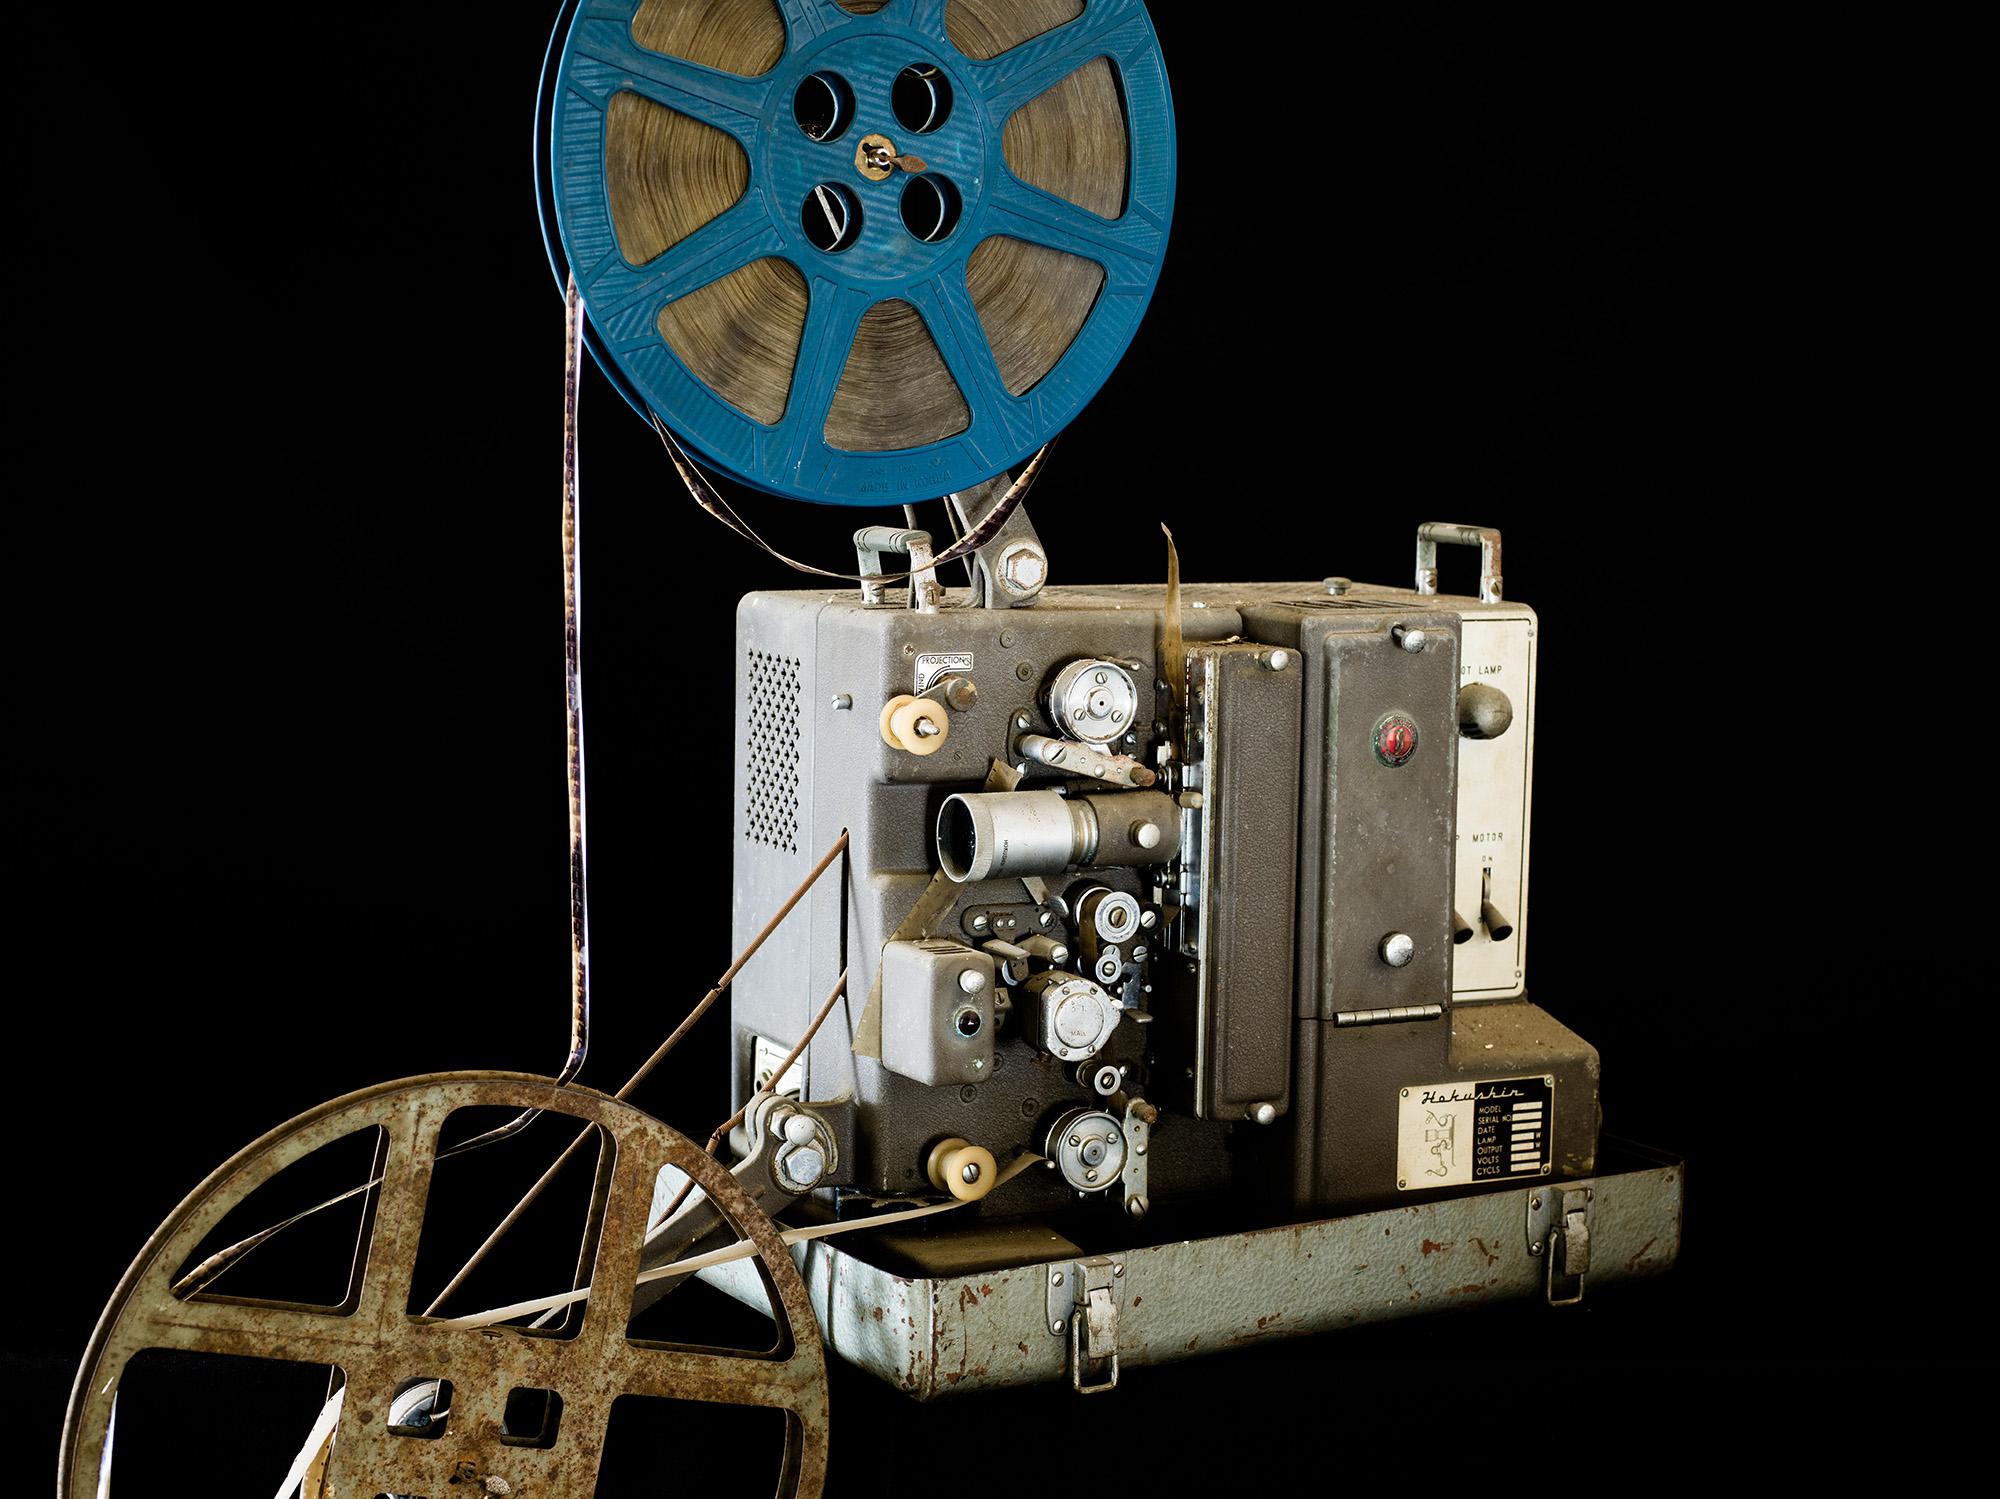 A Japanese Hakushin 16mm film projector.